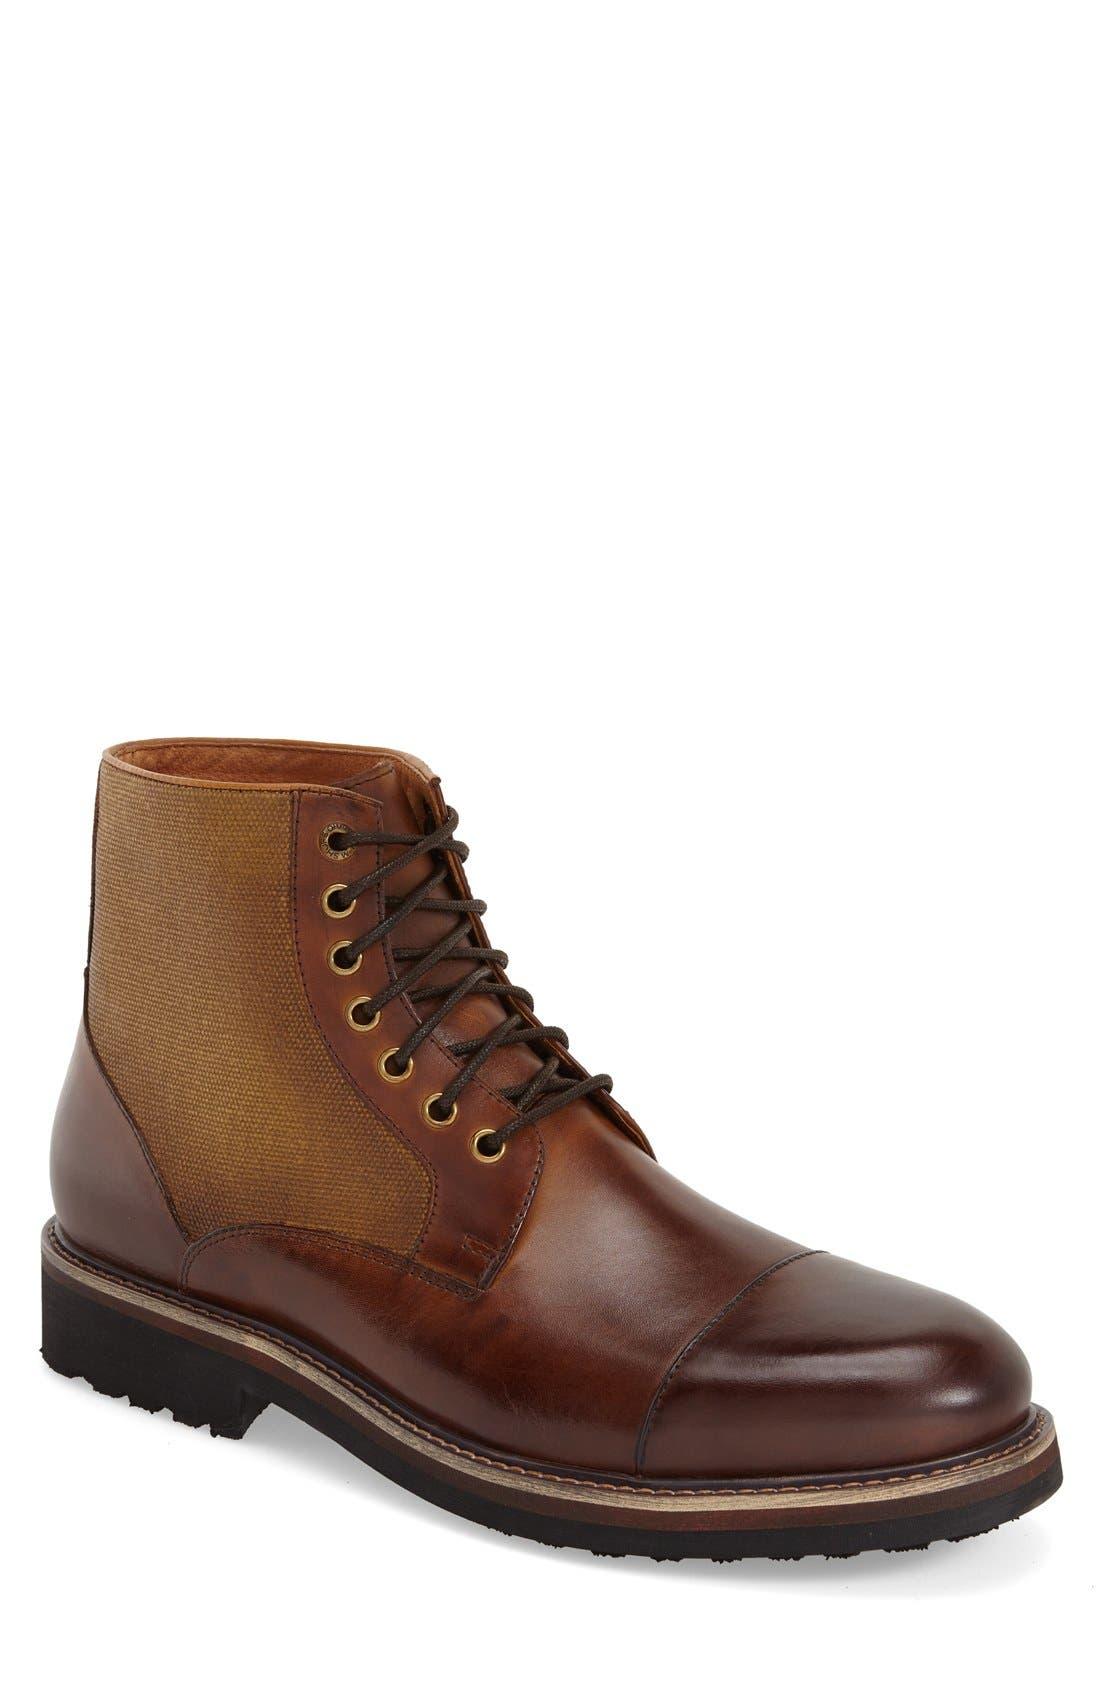 Alternate Image 1 Selected - Zanzara 'Northstar' Cap Toe Boot (Men)